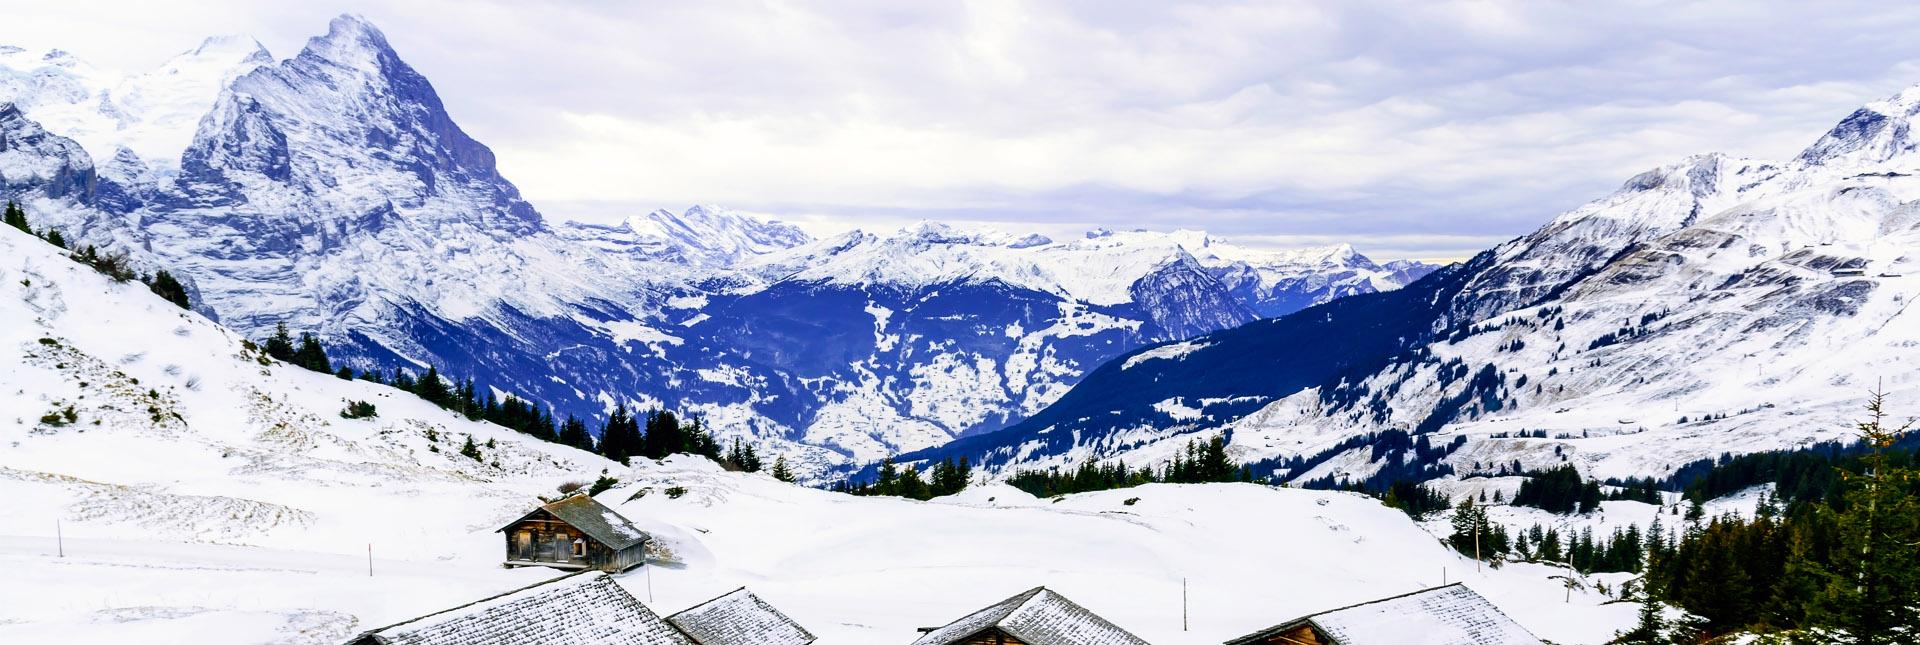 Skiing in Grindelwald